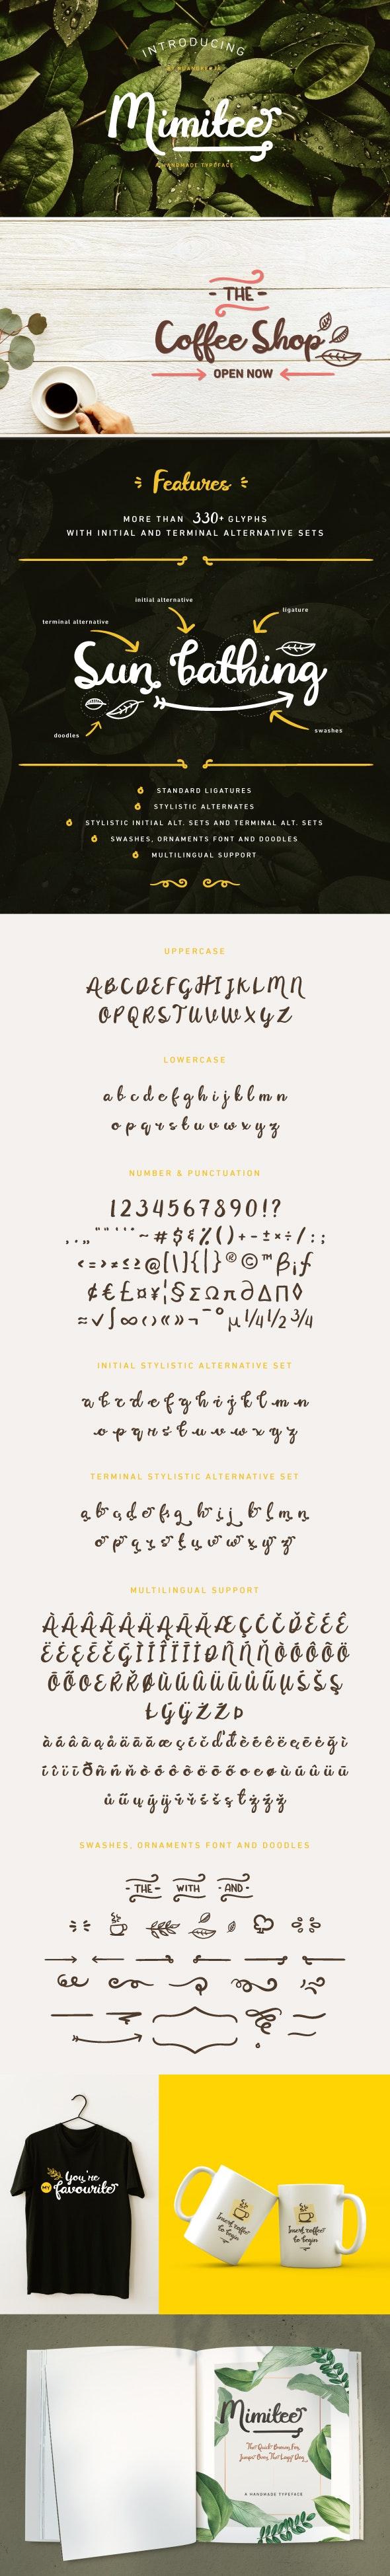 Mimitee Font - Hand-writing Script